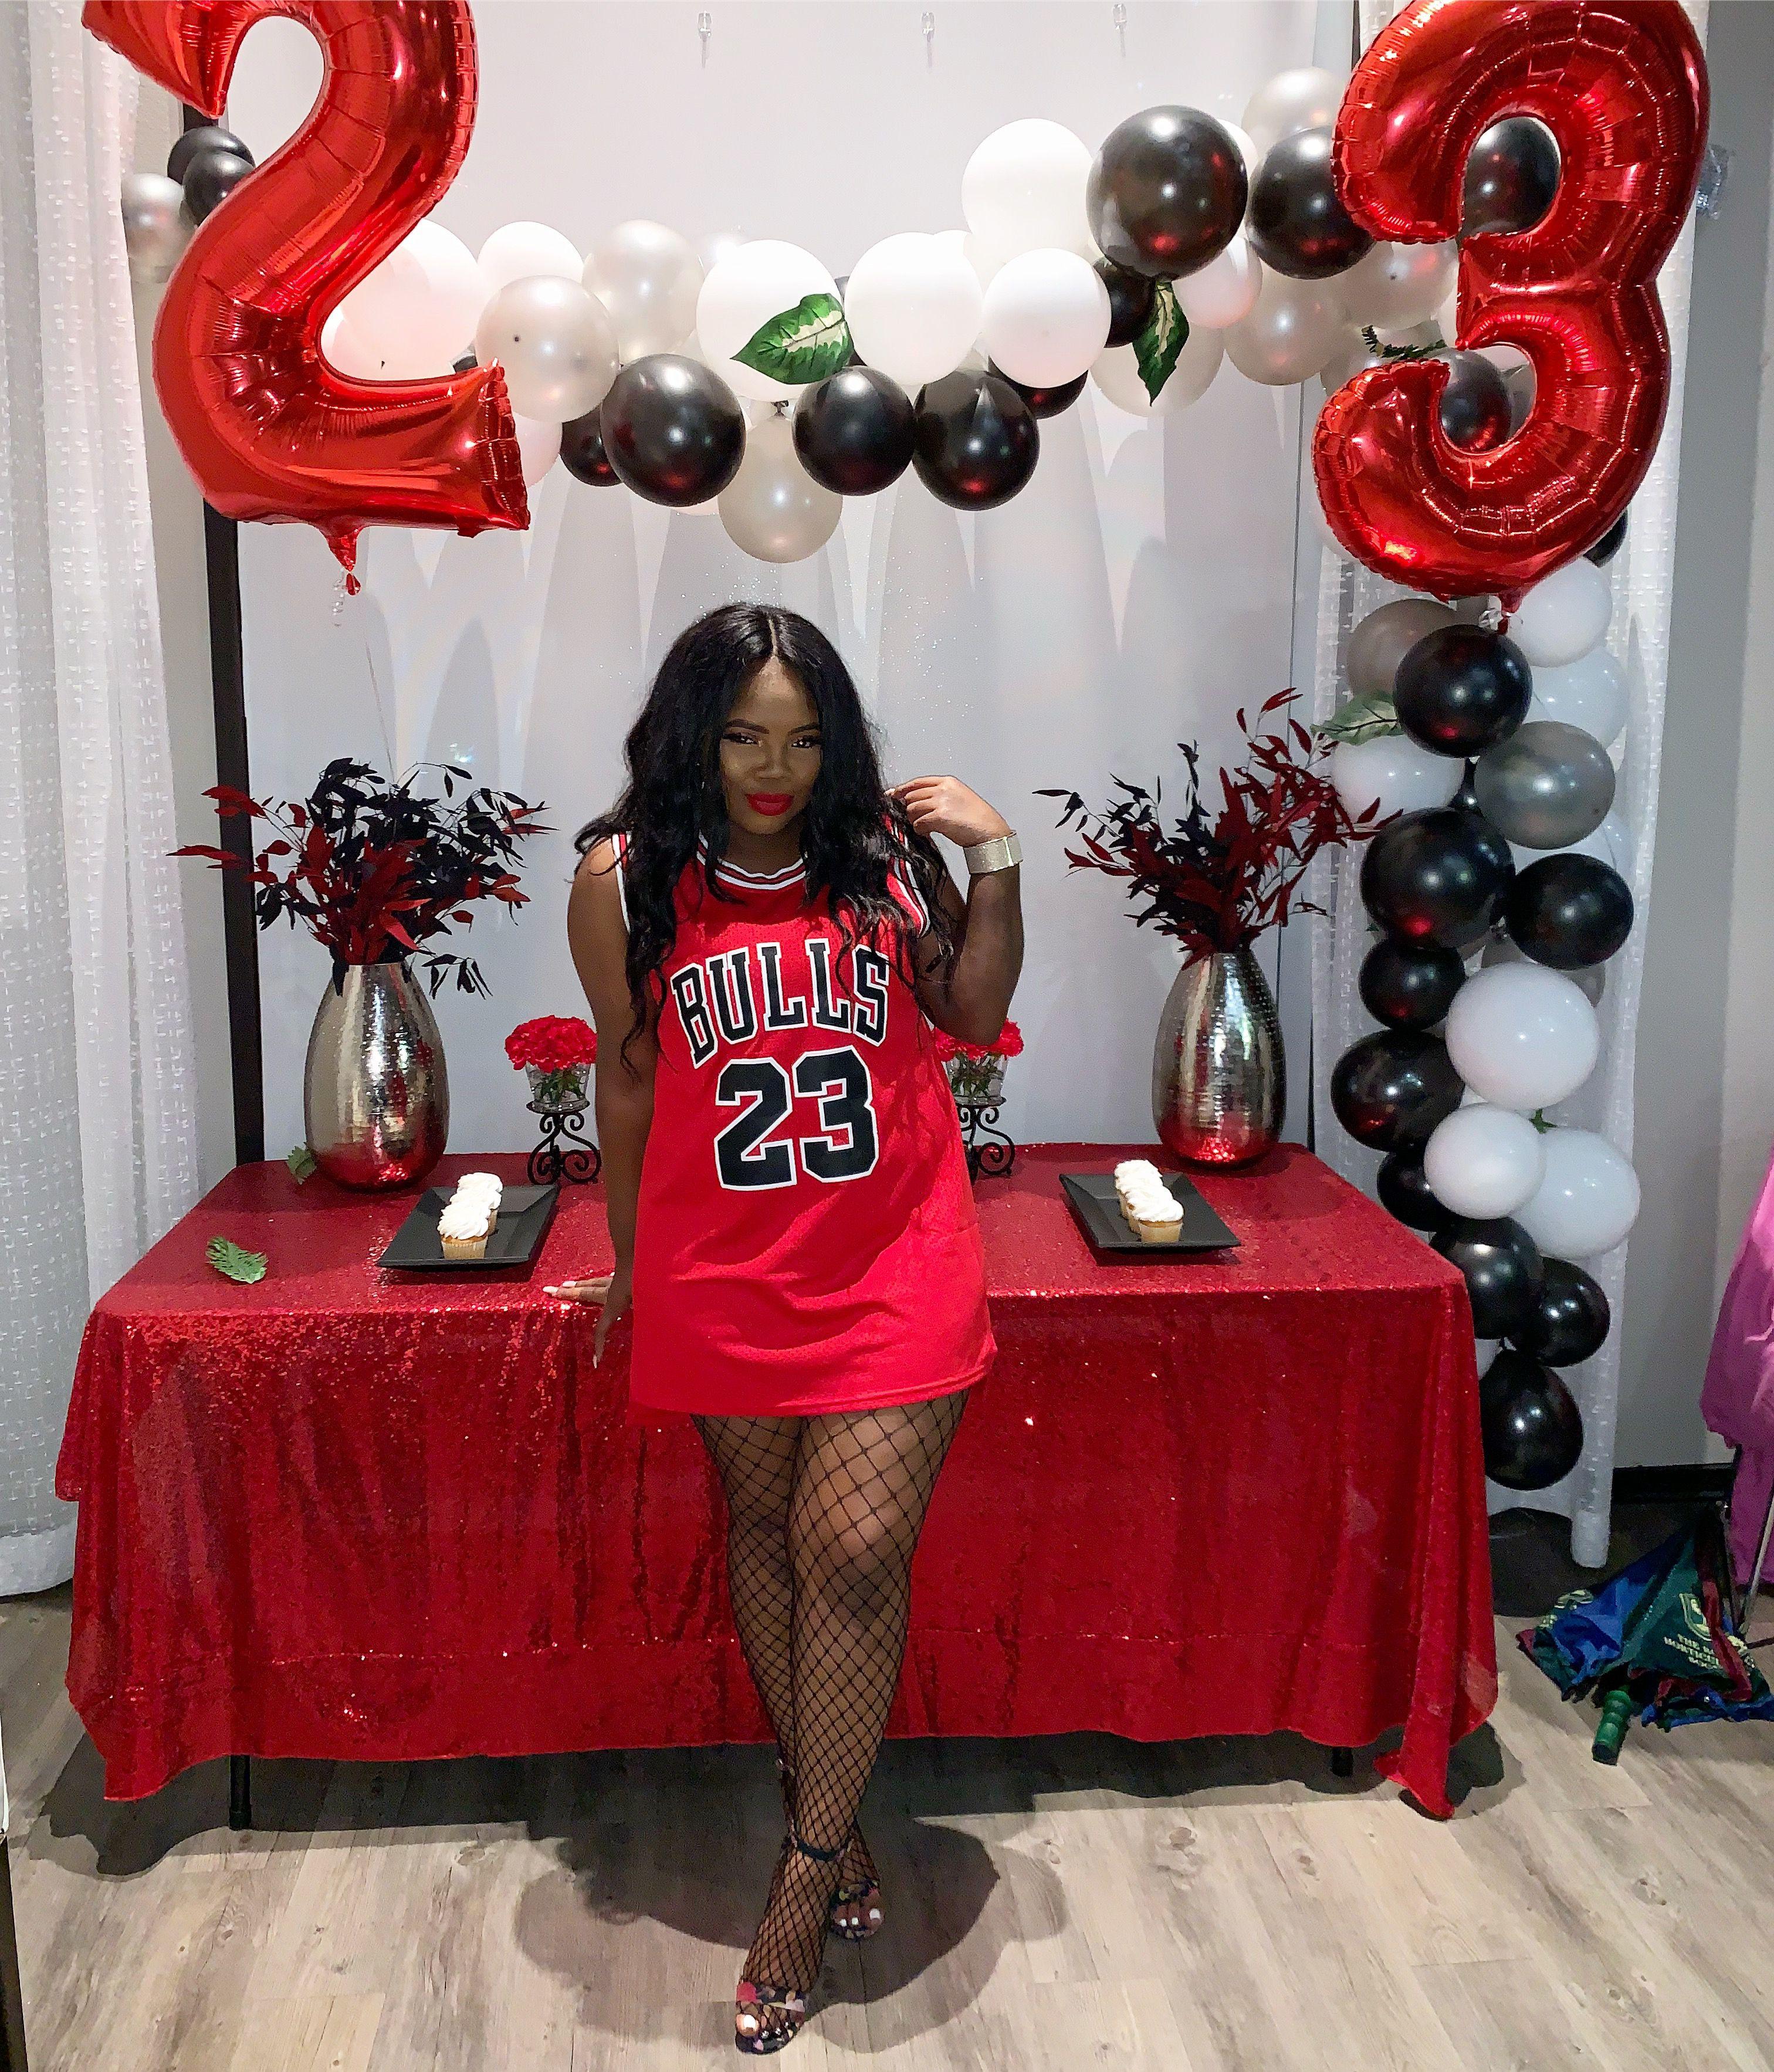 23rd Birthday Outfits In 2021 Birthday Photoshoot 23rd Birthday Ideas 23rd Birthday